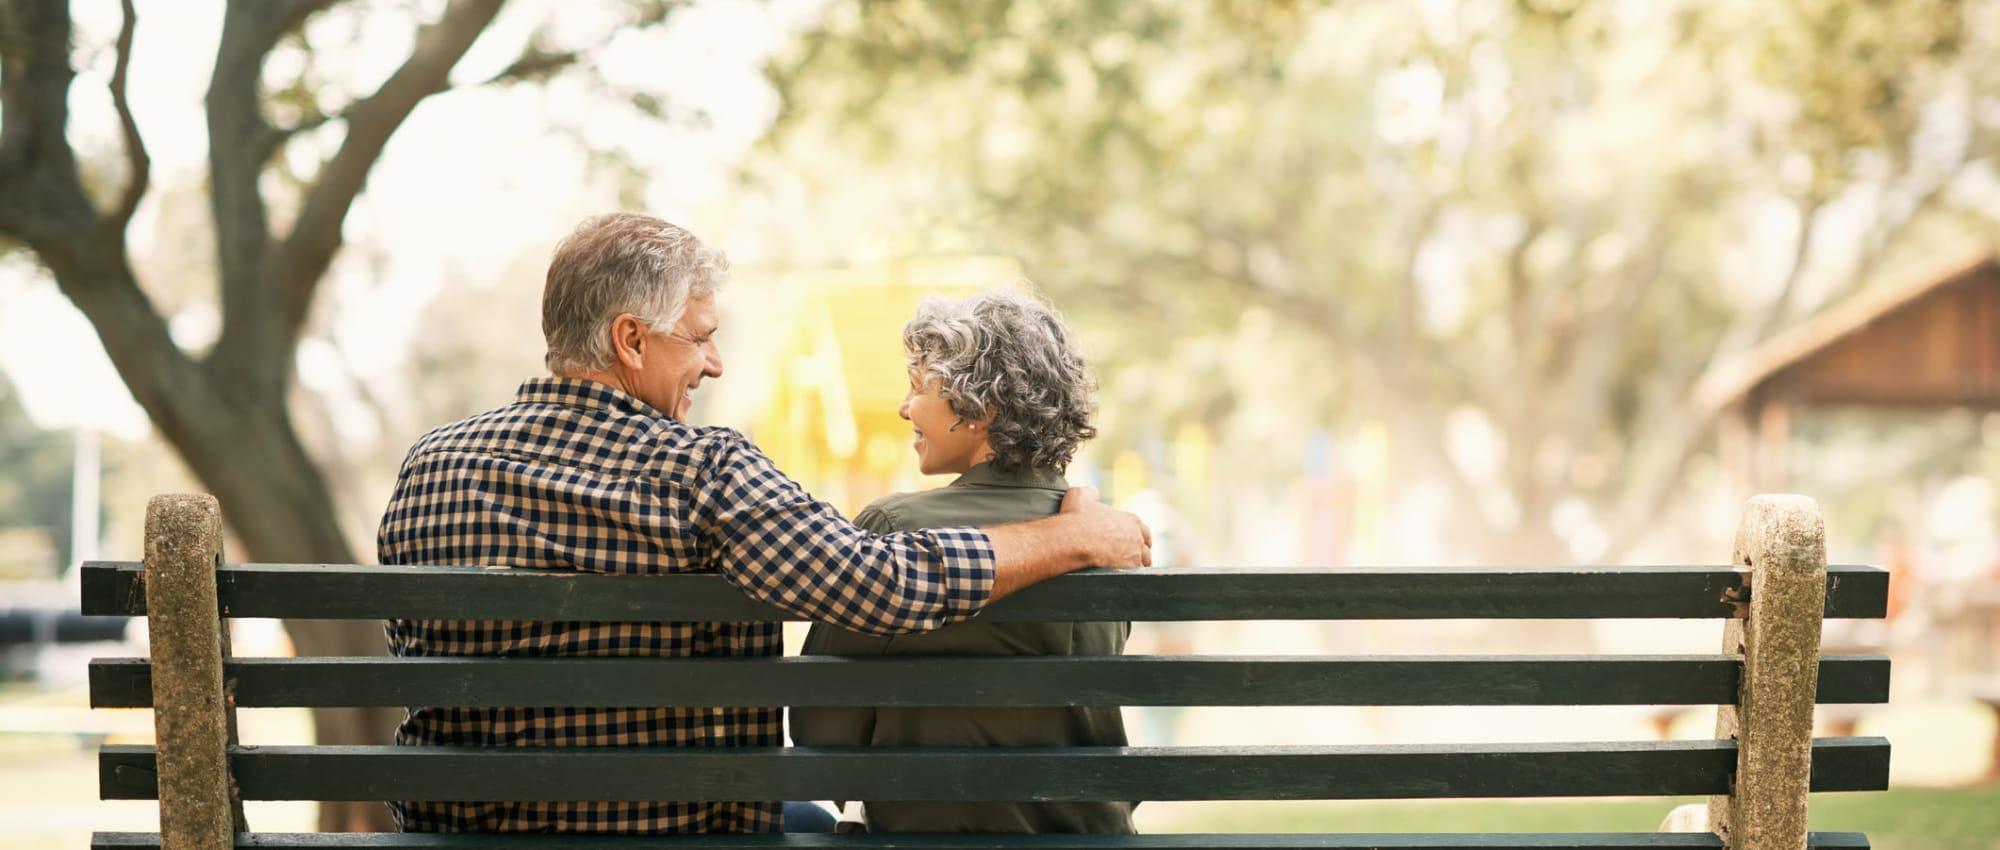 News at Milestone Senior Living in Stoughton, Wisconsin.